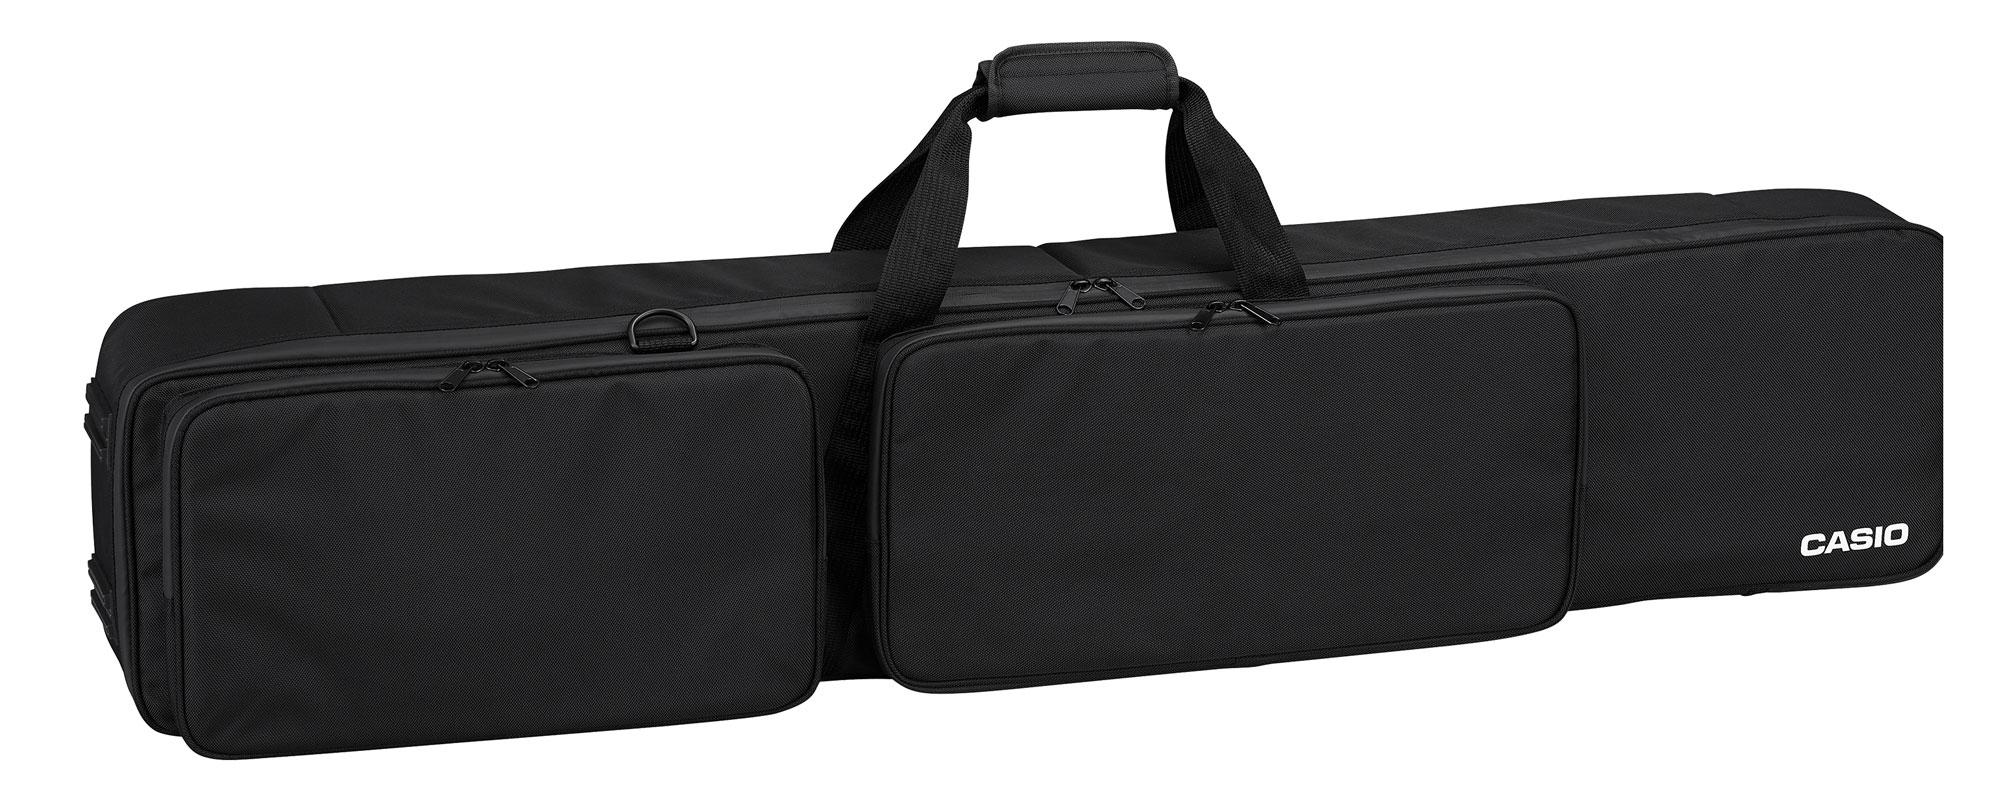 Casio SC 800P Transporttasche